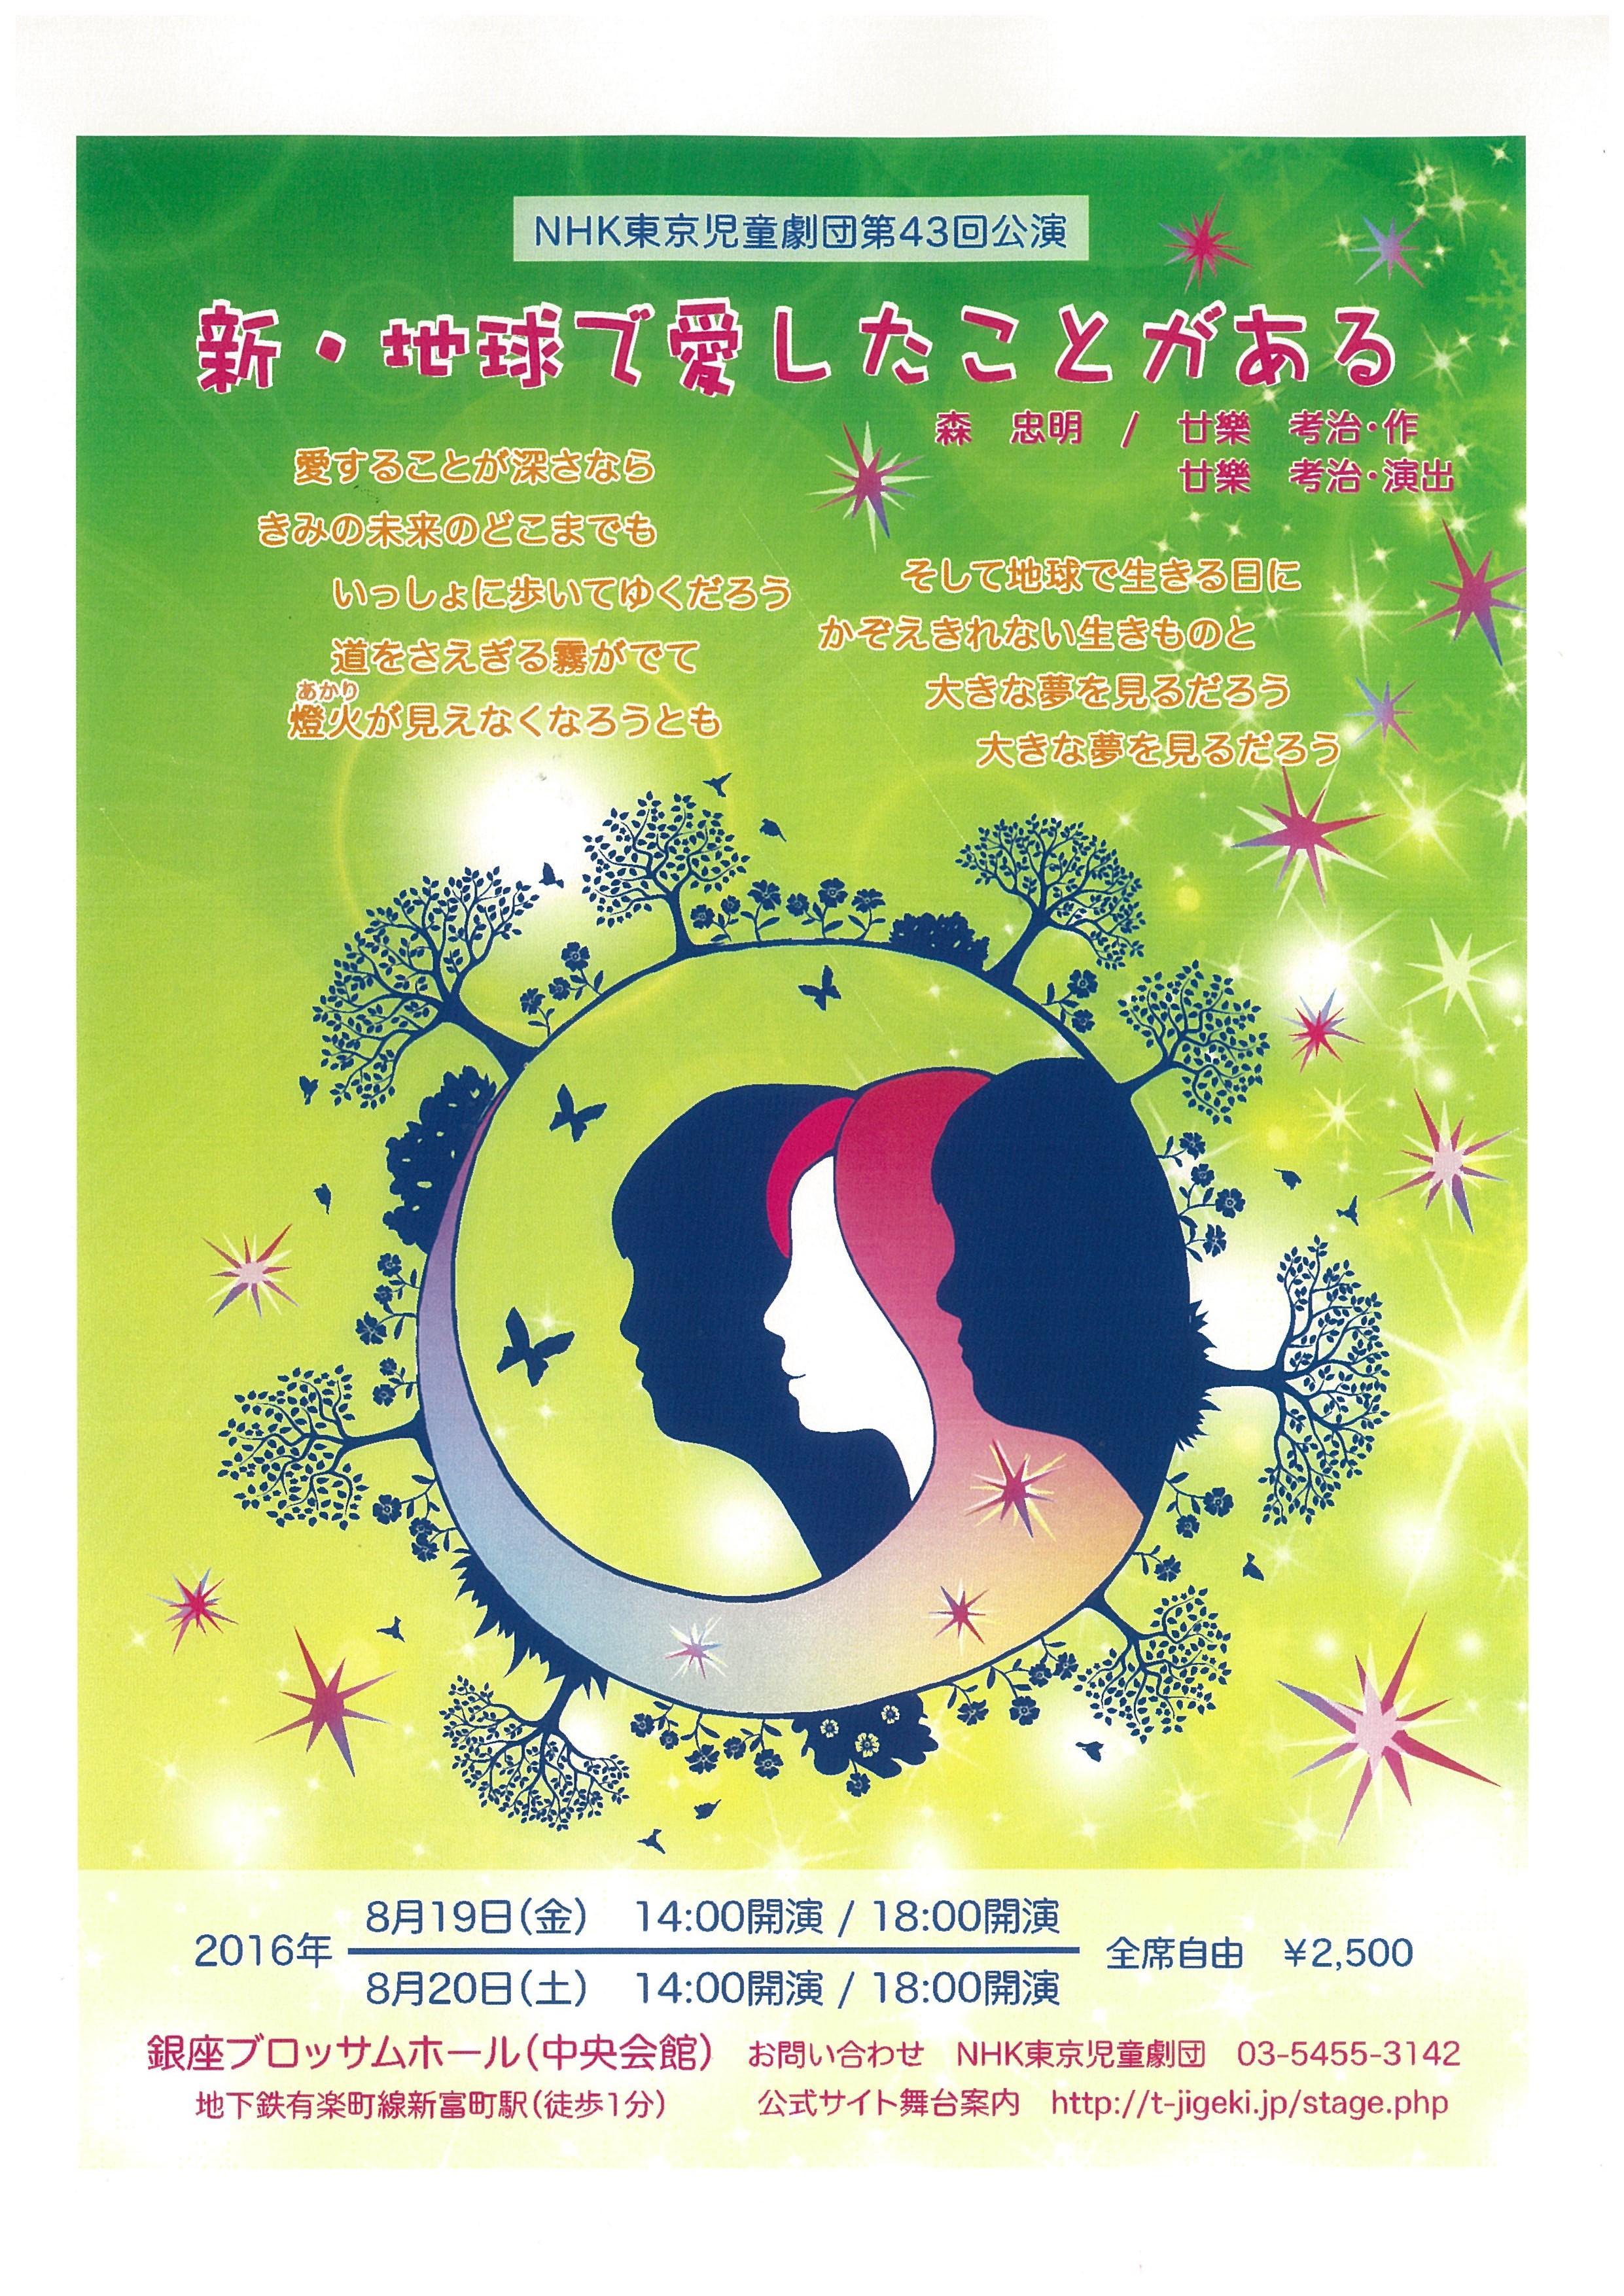 NHK東京児童劇団第43回公演 新・地球で愛したことがある